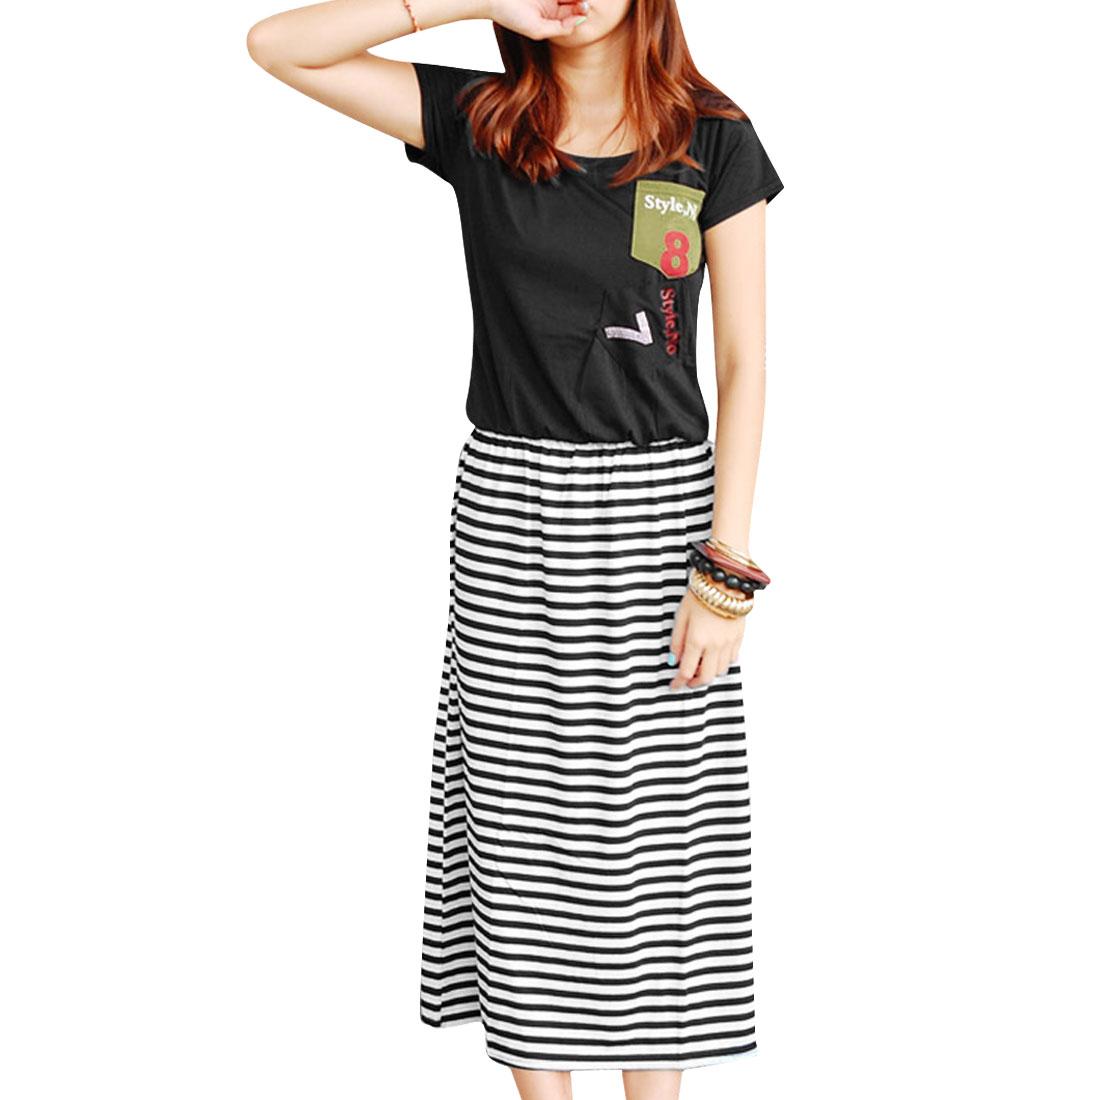 Lady New Fashion Scoop Neck Chest Pockets Stripes Pattern Dress Black XS